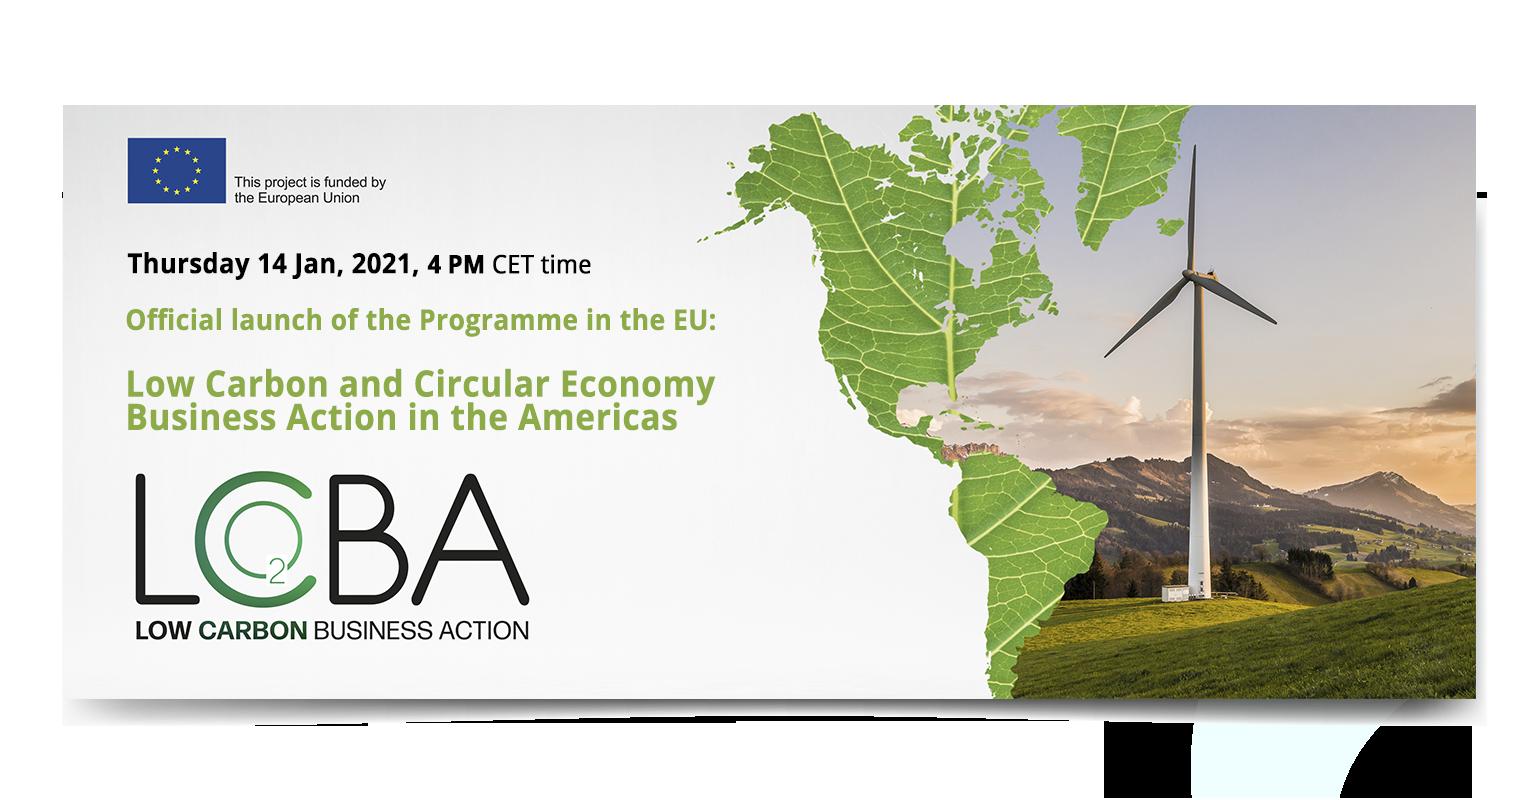 Low Carbon Business Action